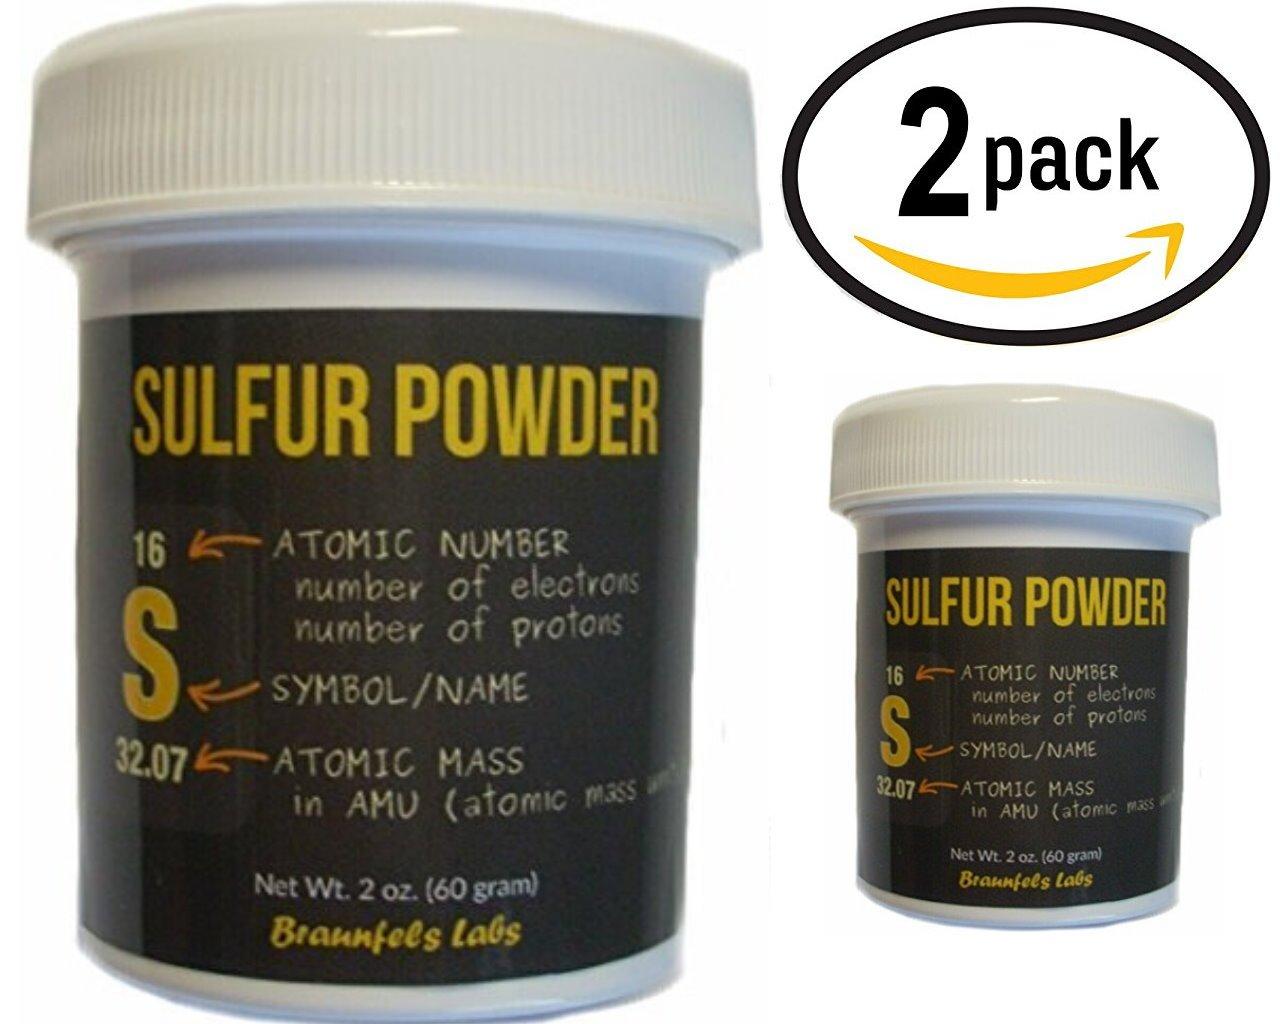 2 Pack - Braunfels Labs Sulfur Powder - Very